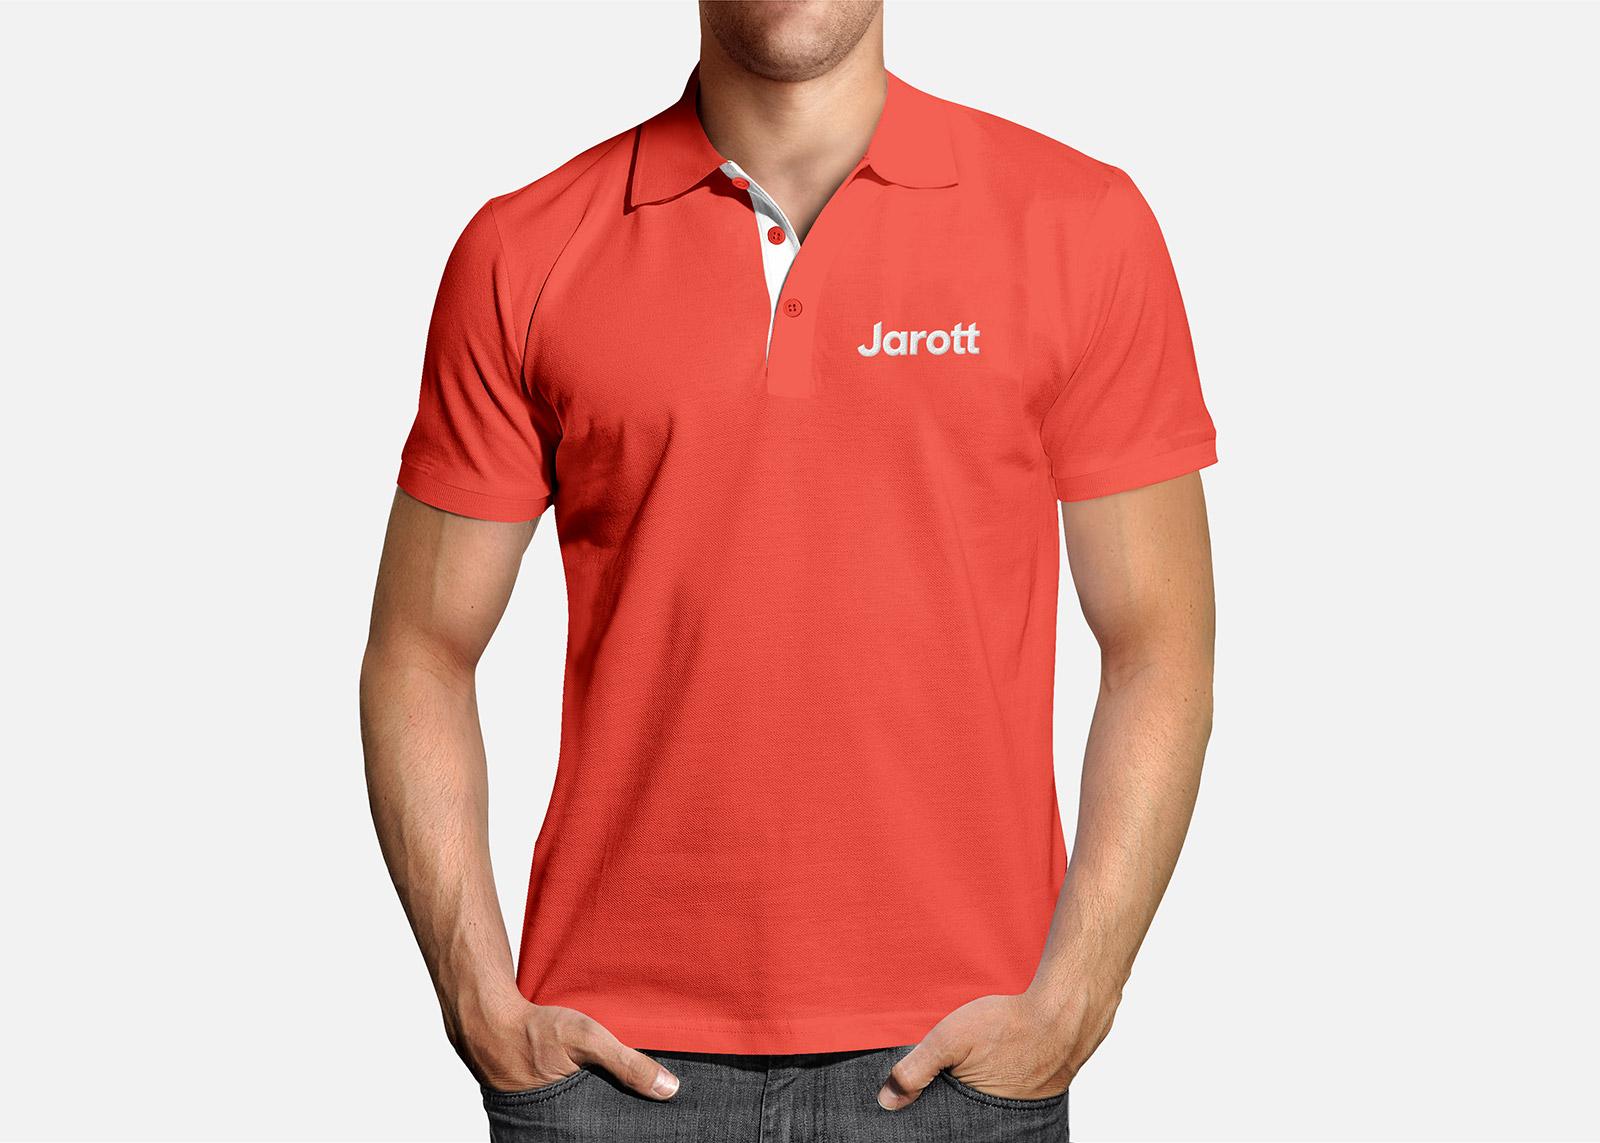 Jarott t-shirt